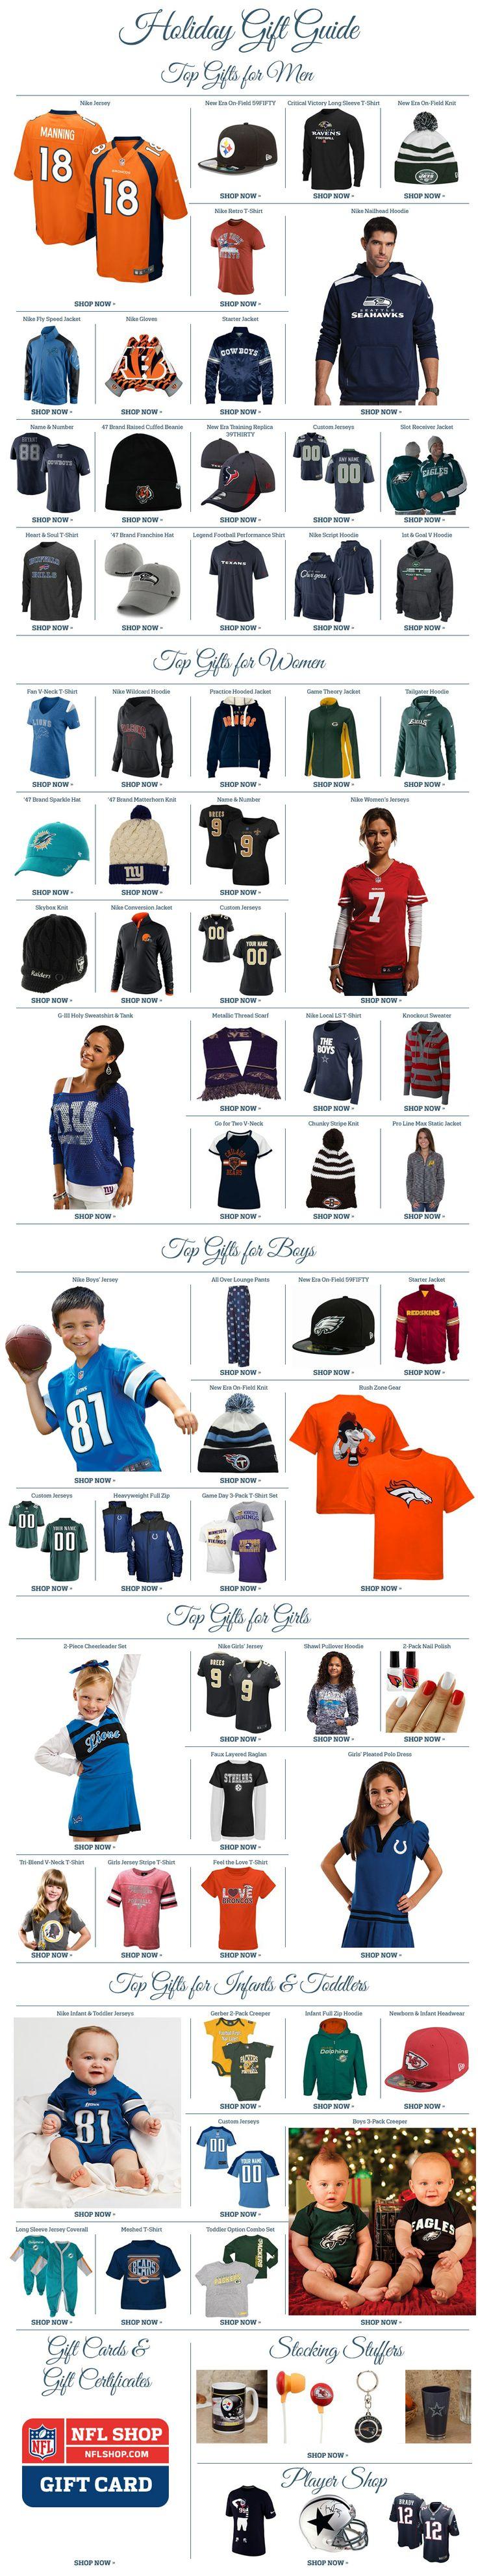 Best 25+ Nfl shop ideas on Pinterest | Nfl jerseys, Nfl shop ...